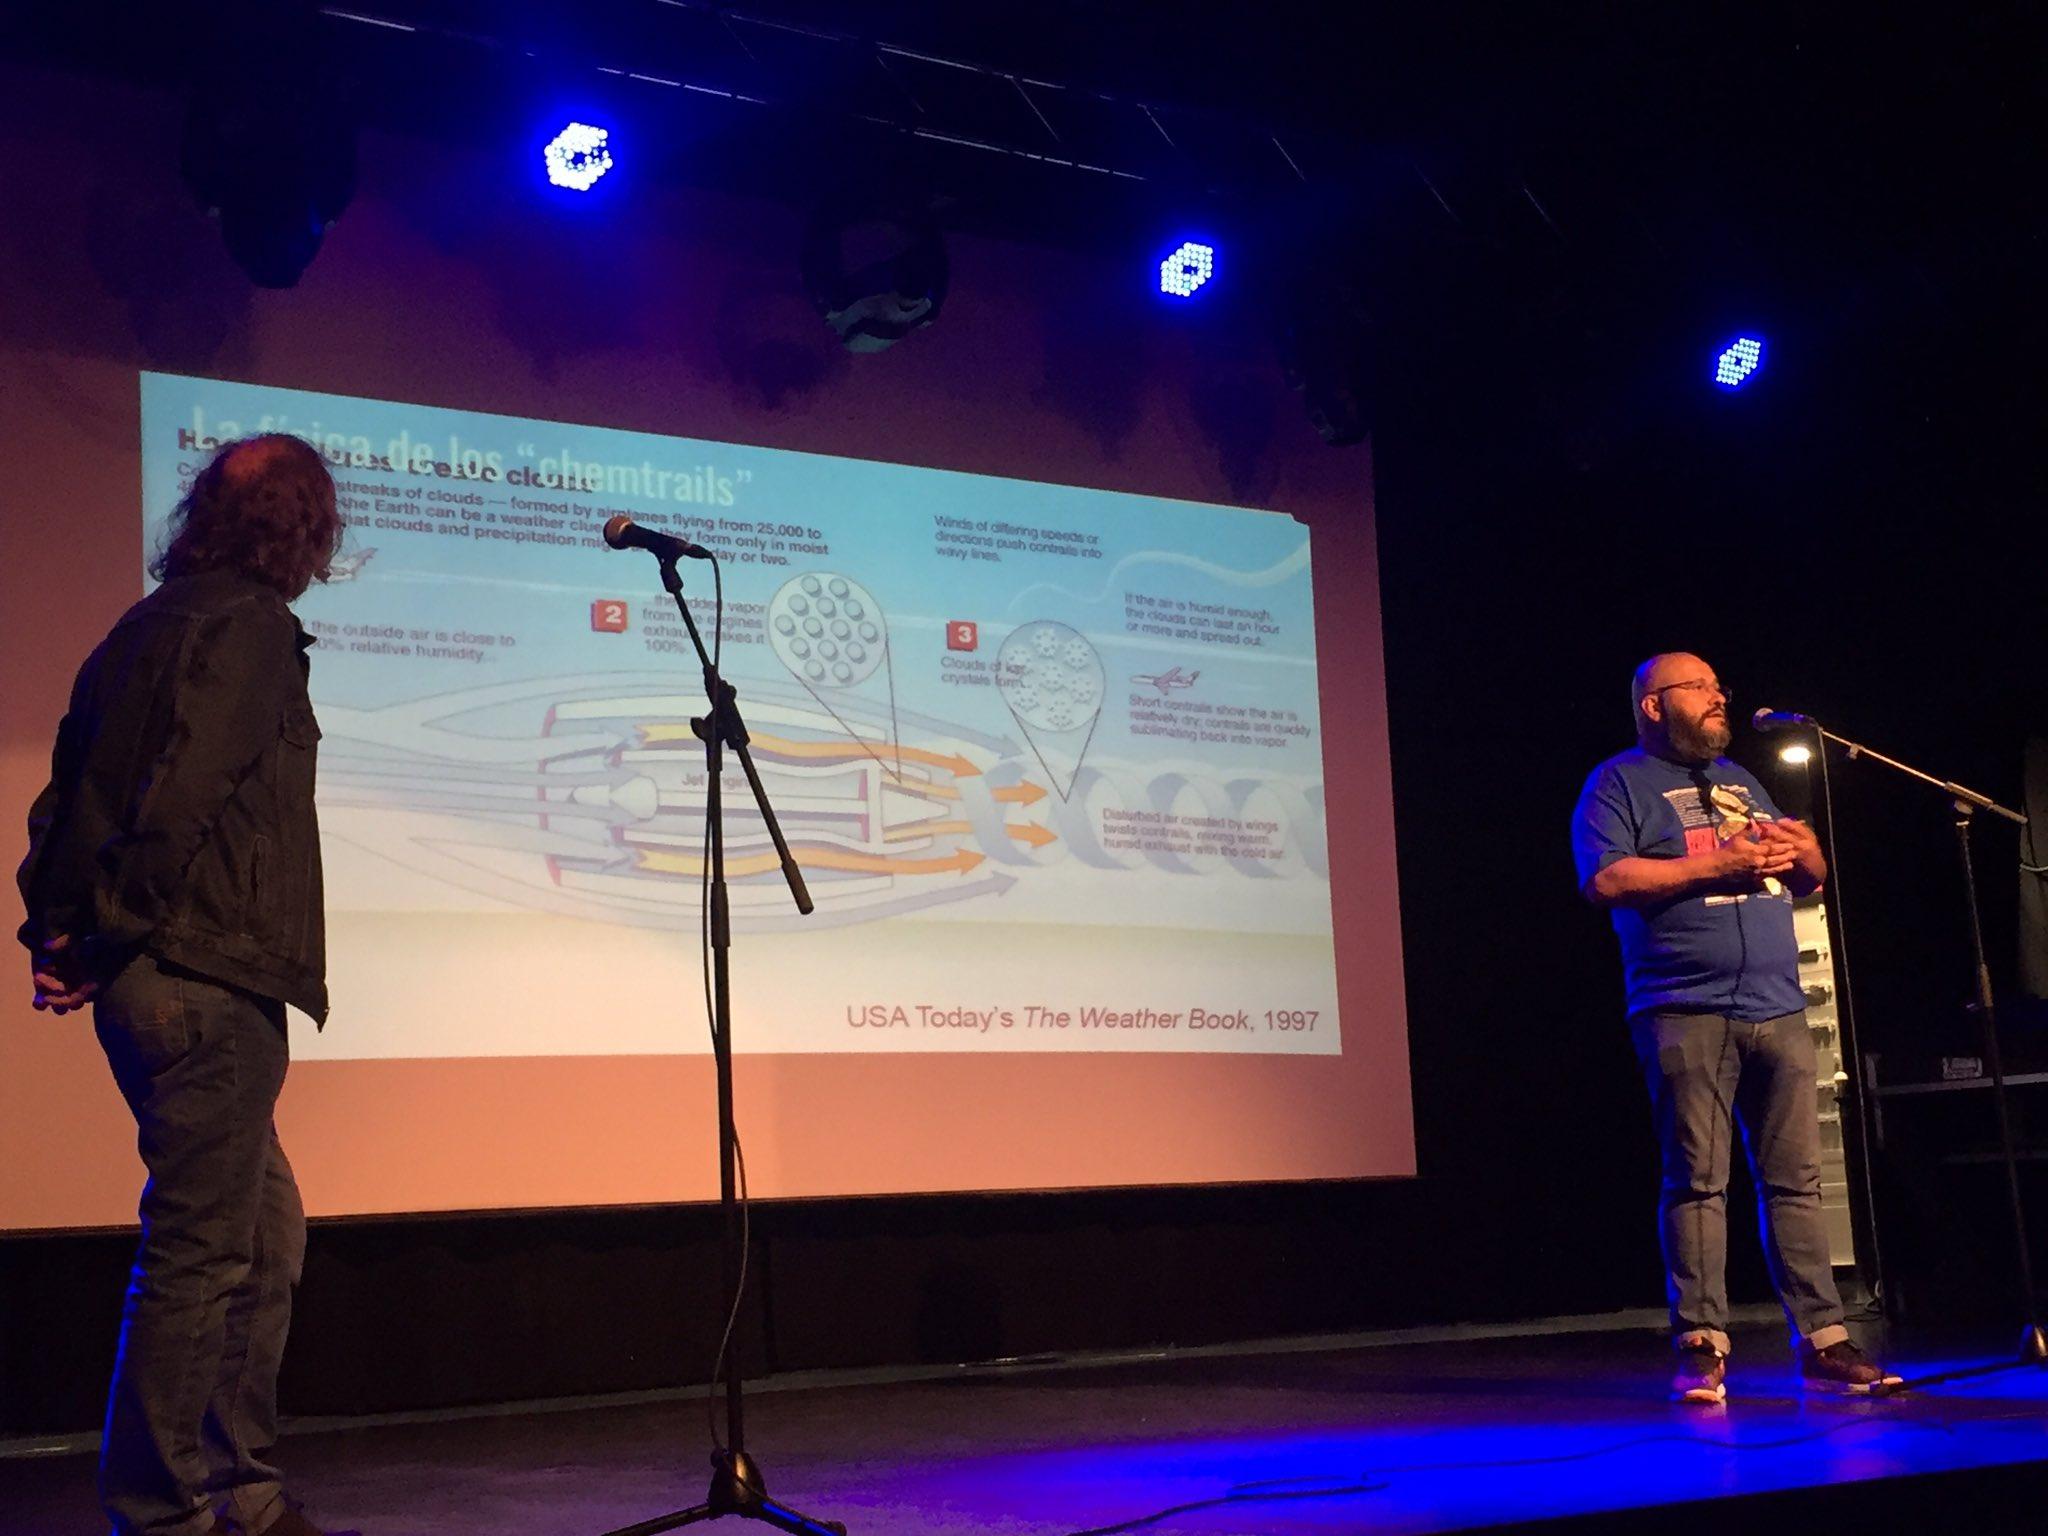 Es turno de @javierarmentia que nos habla de los #Chemtrails #PintofScience2017 #Pint17PNA https://t.co/BBDx8o6n3q